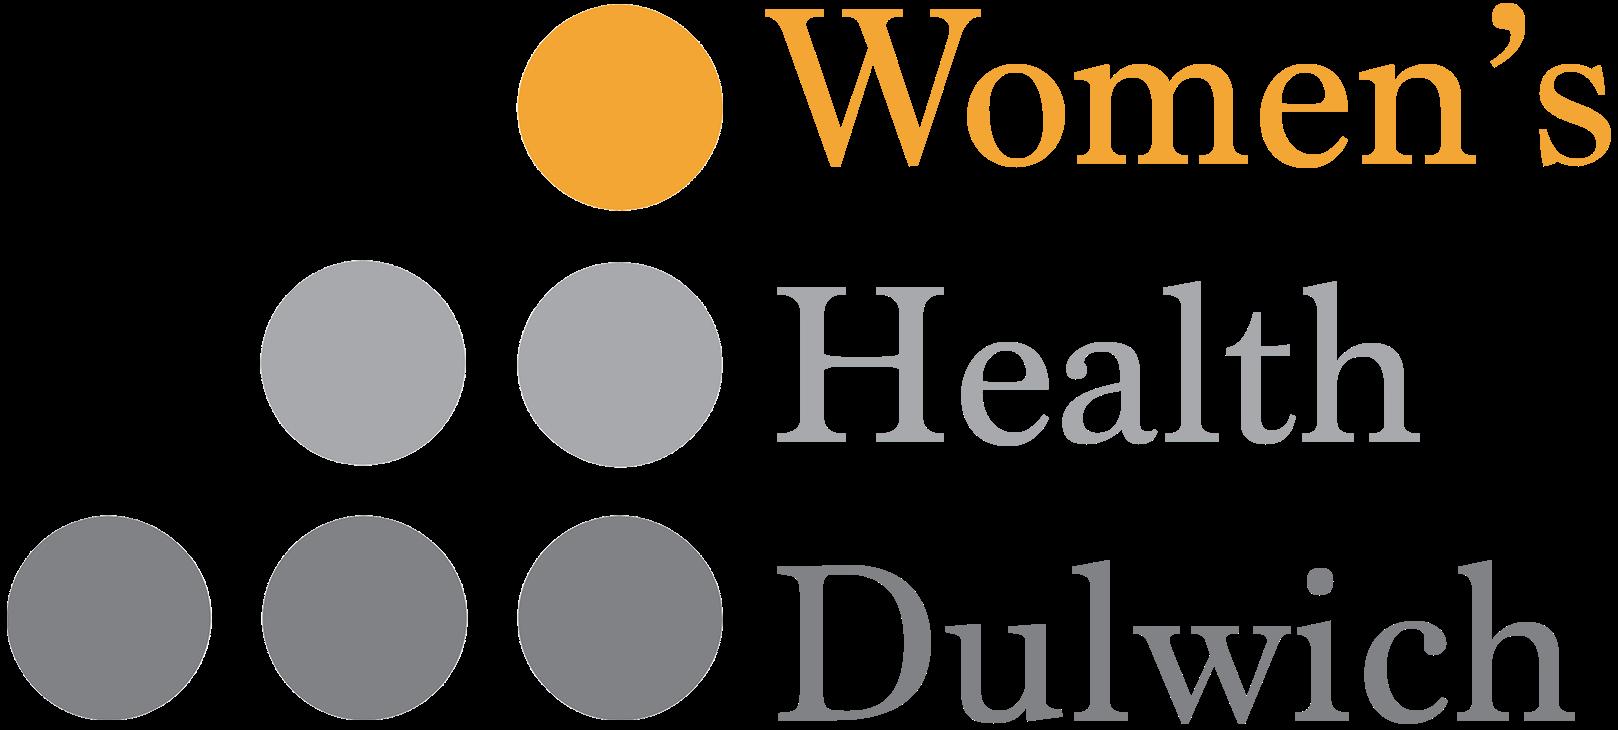 Women's Health Dulwich company logo